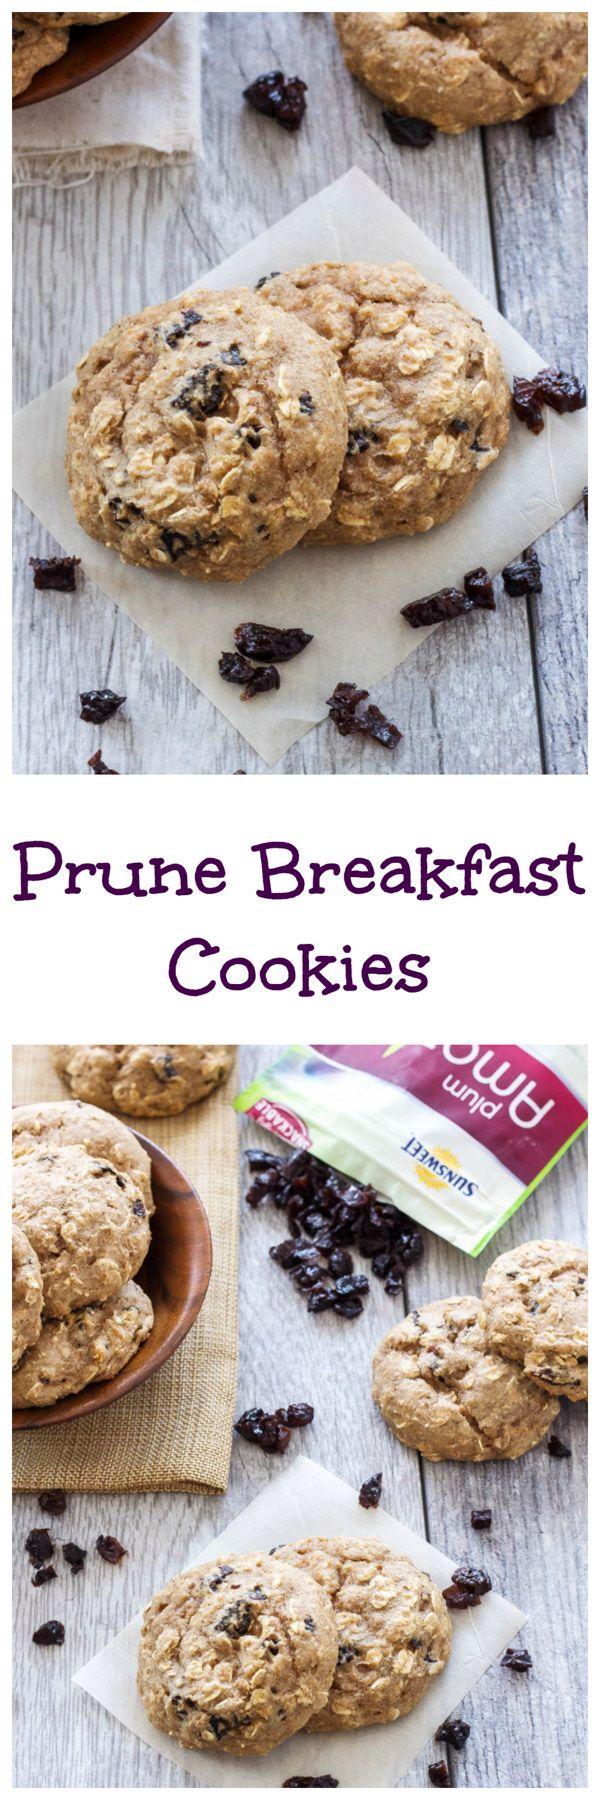 Prune Breakfast Cookies | Delicious and healthy breakfast cookies full of sweet diced prunes! | www.reciperunner.com